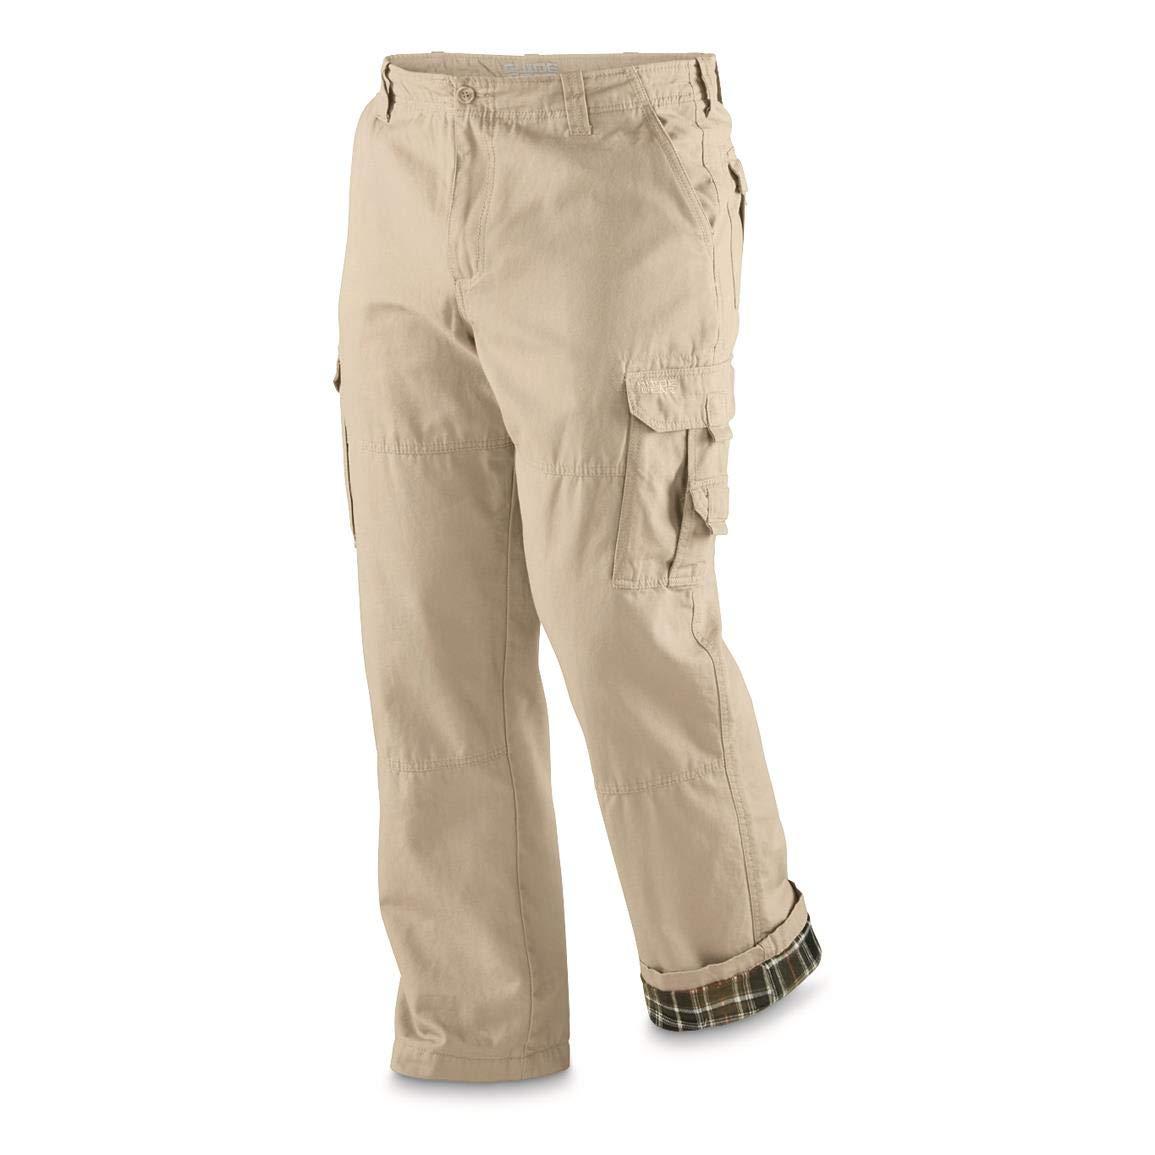 464446dea Amazon.com: Guide Gear Men's Flannel Lined Cargo Pants: Clothing